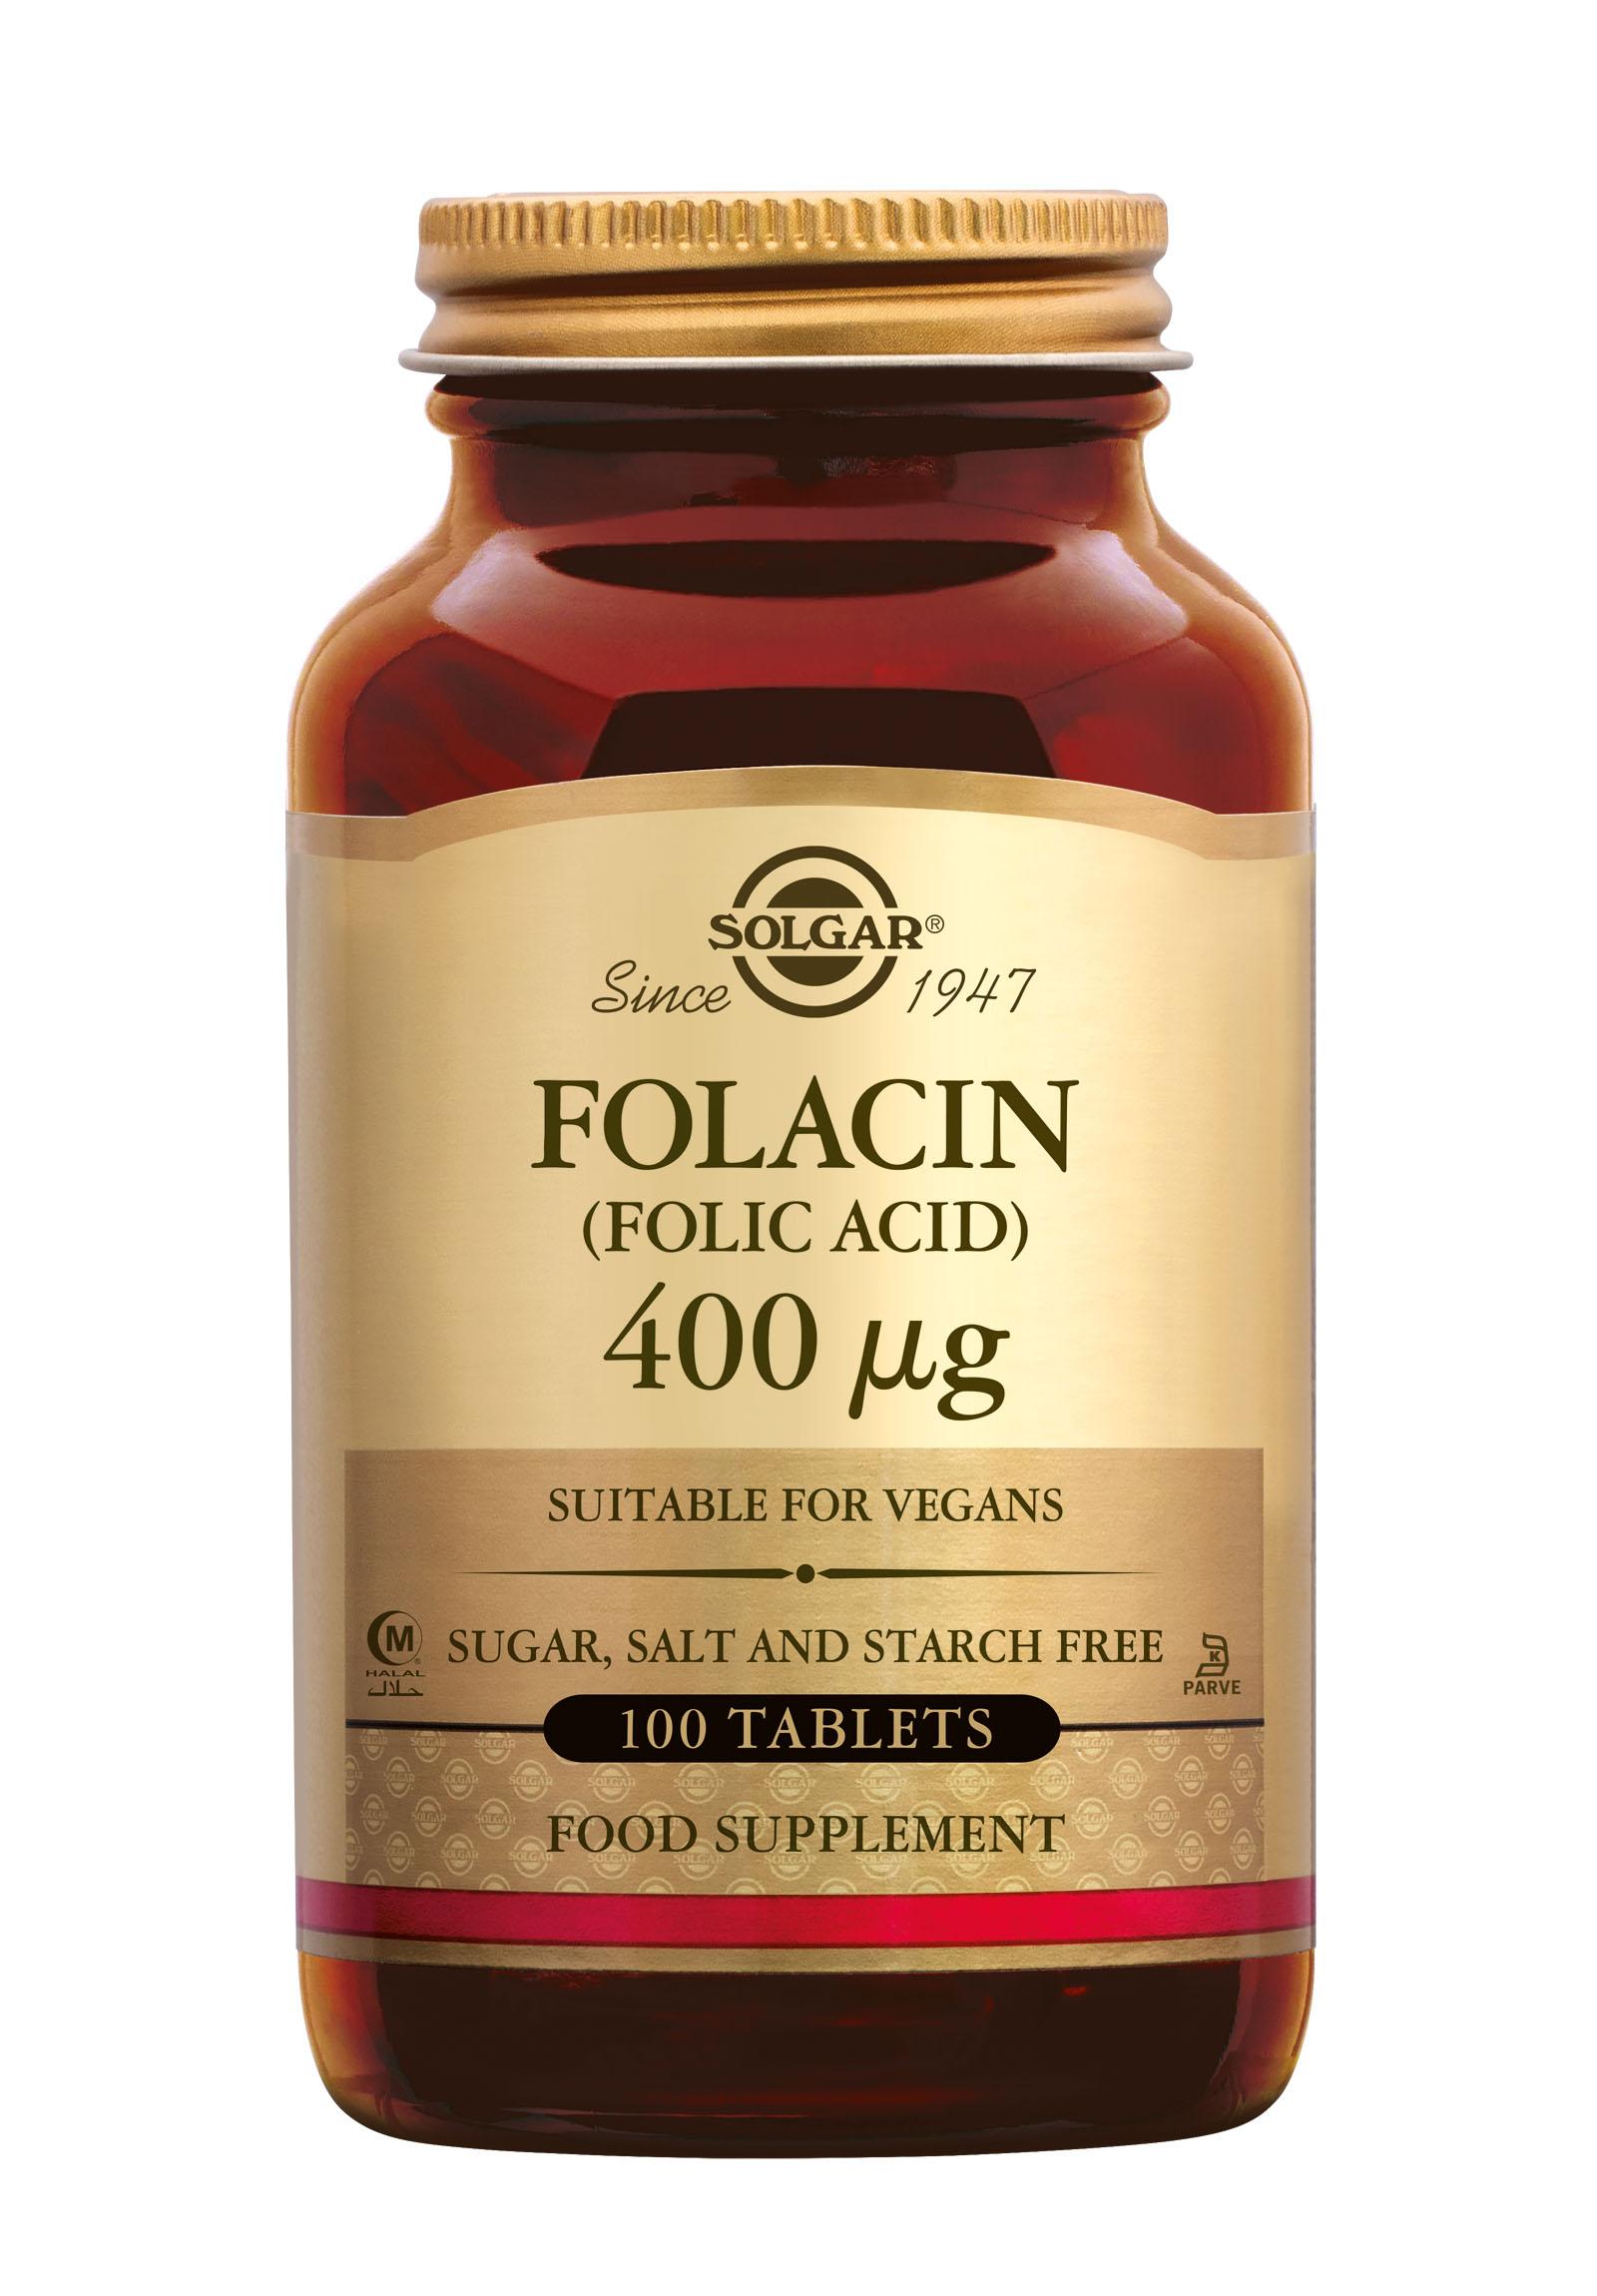 Folacin (folic acid) 400 mcg